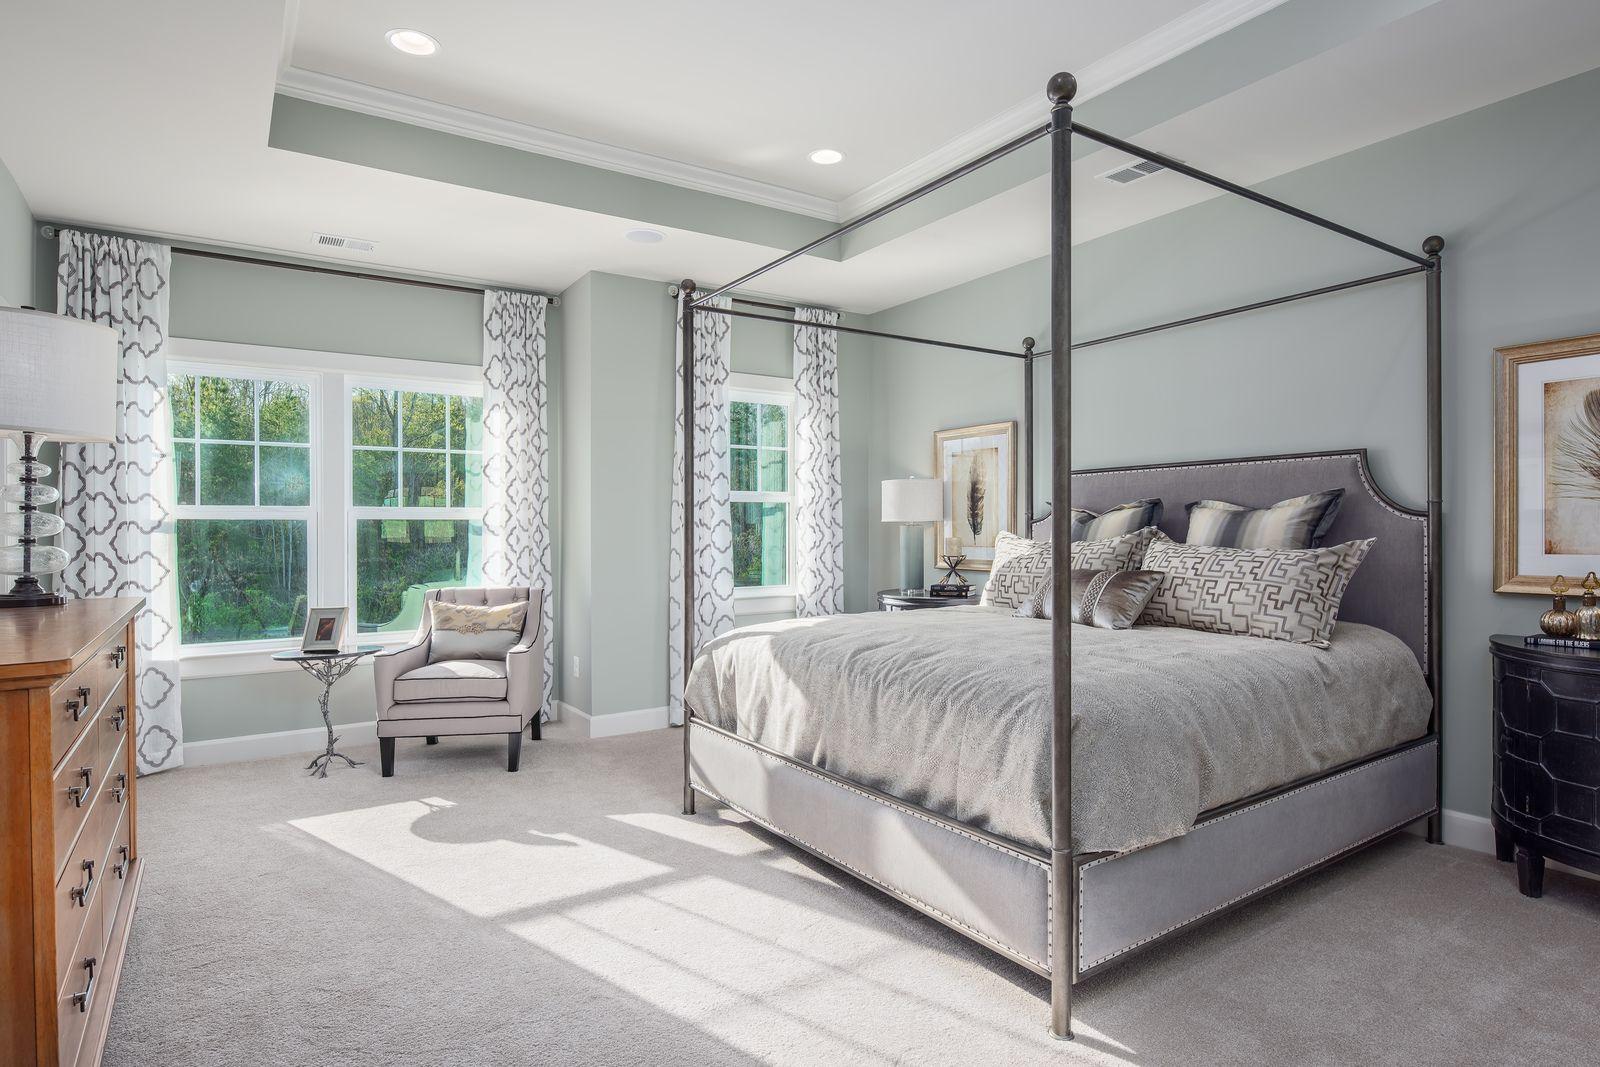 Bedroom-in-Longwood-at-Fairwood-in-Bowie